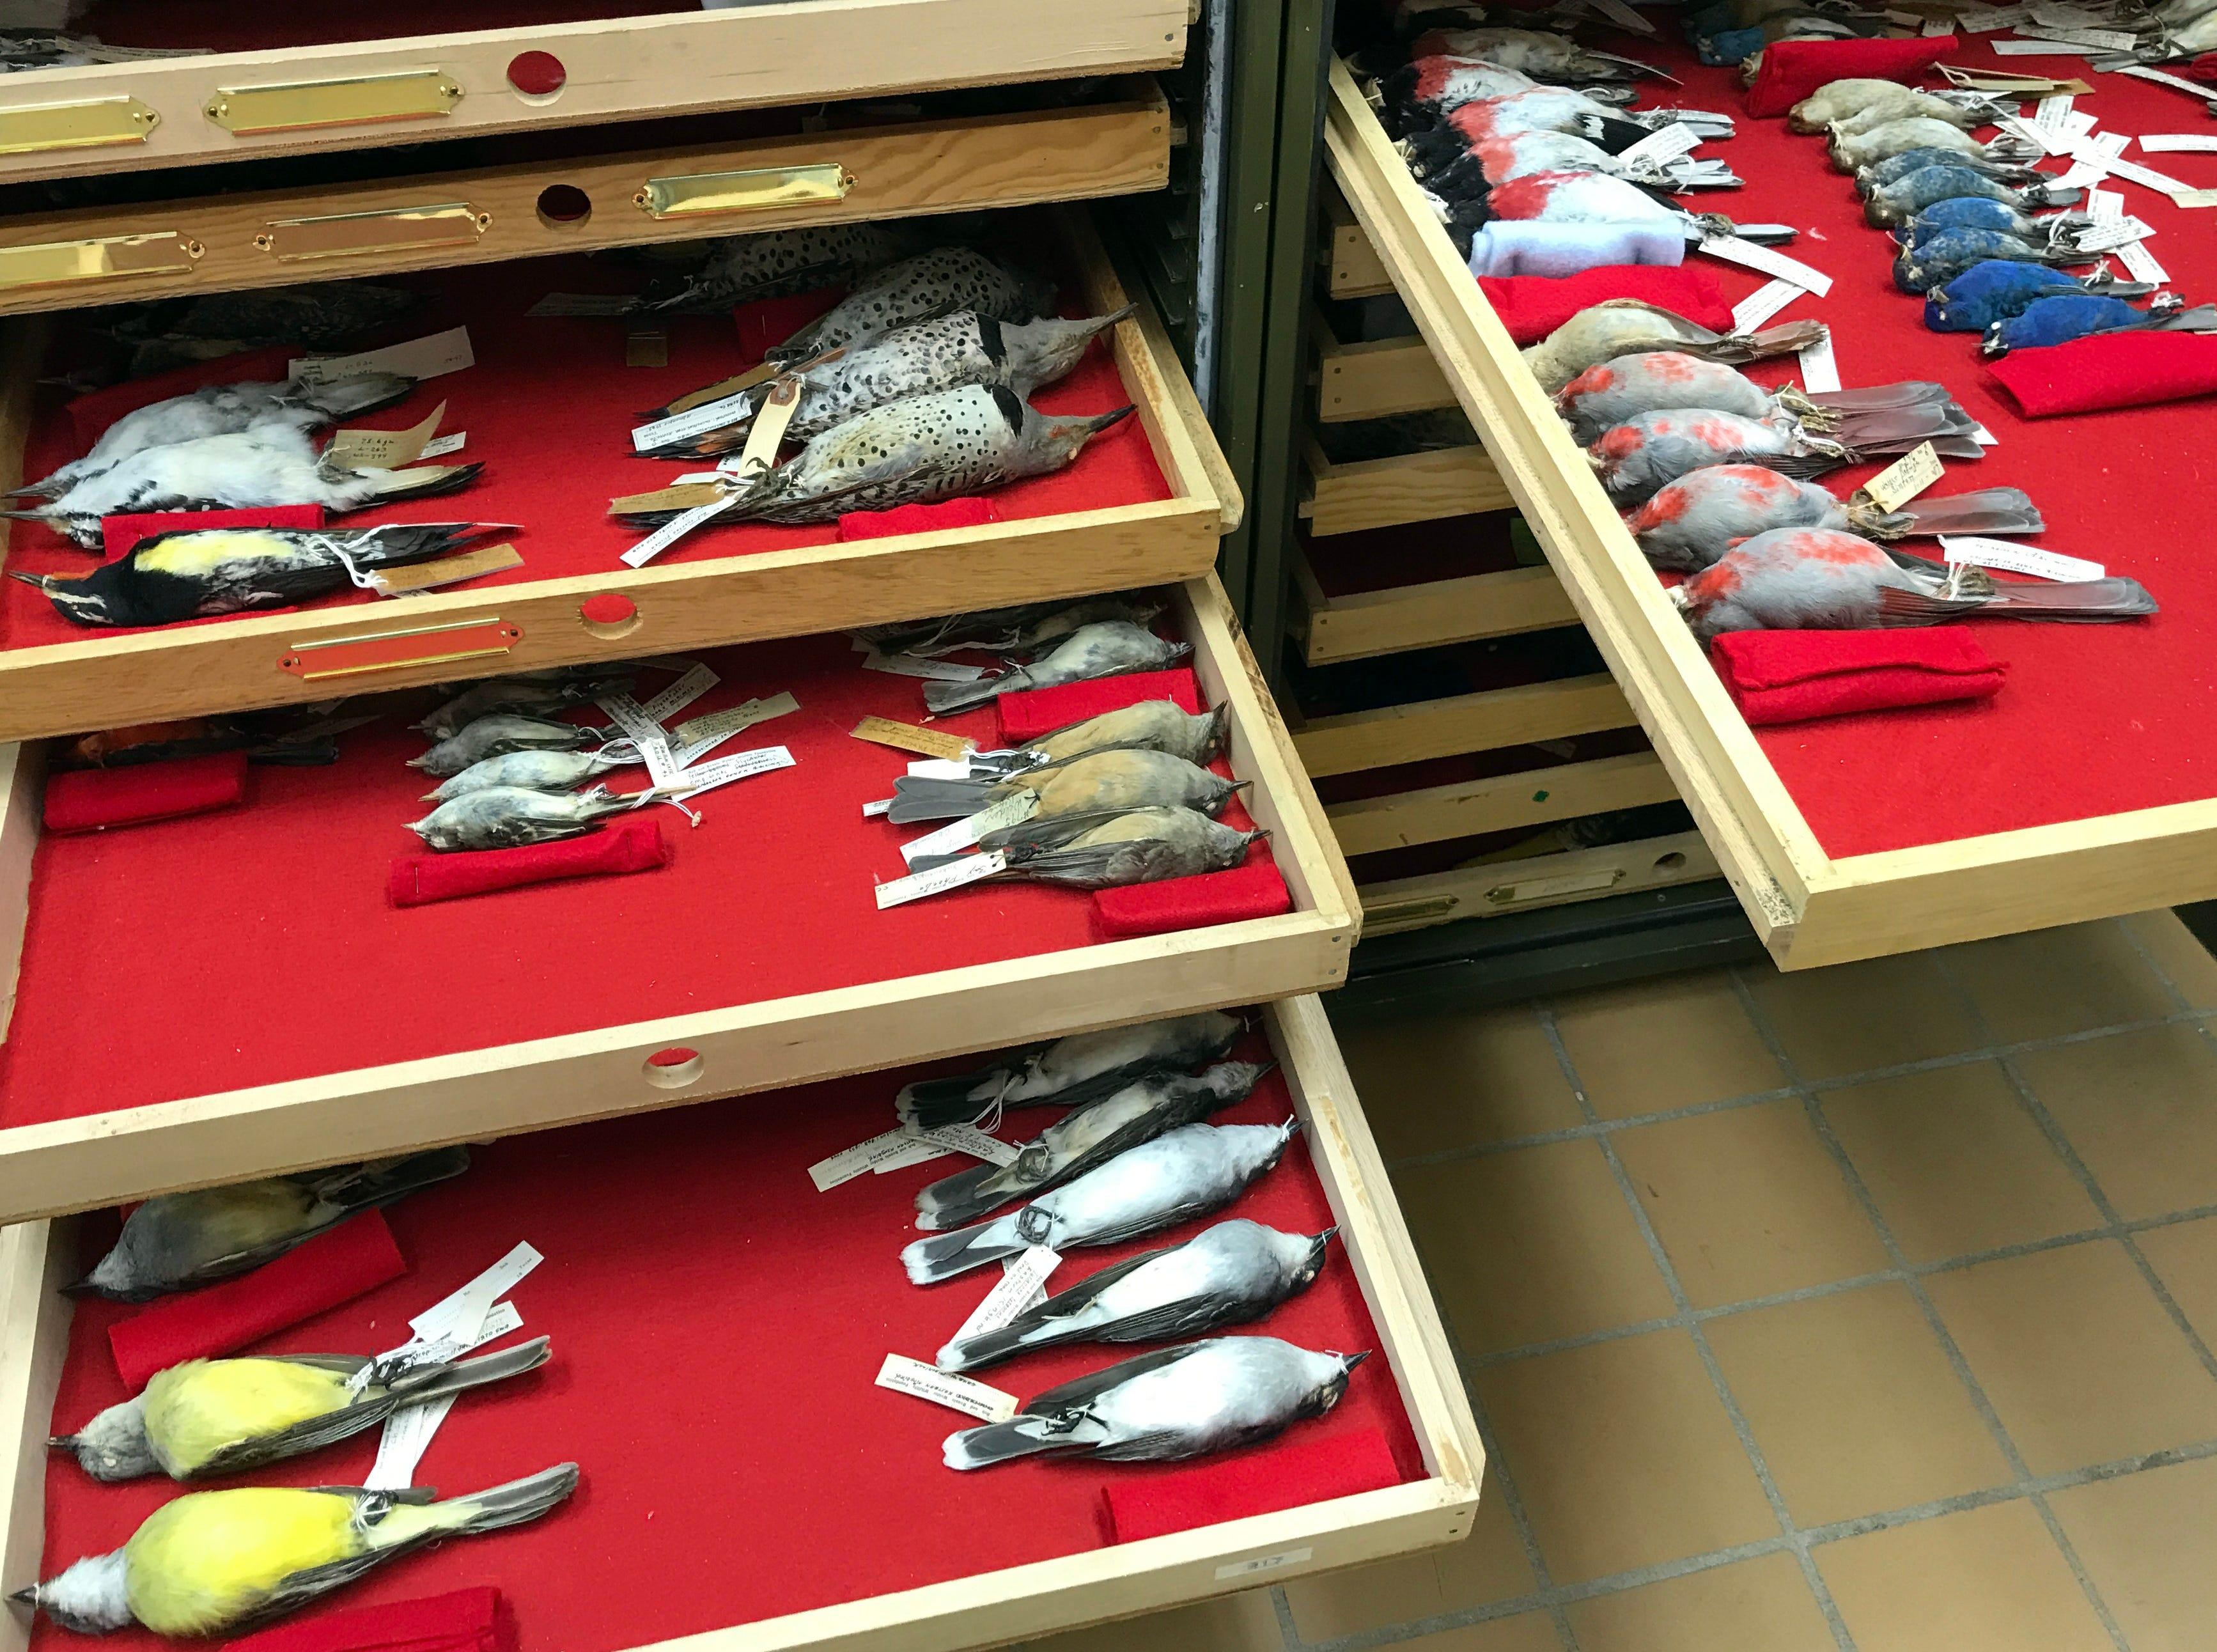 The Welder Wildlife Foundation houses hundreds of preserved wildlife specimens for research.